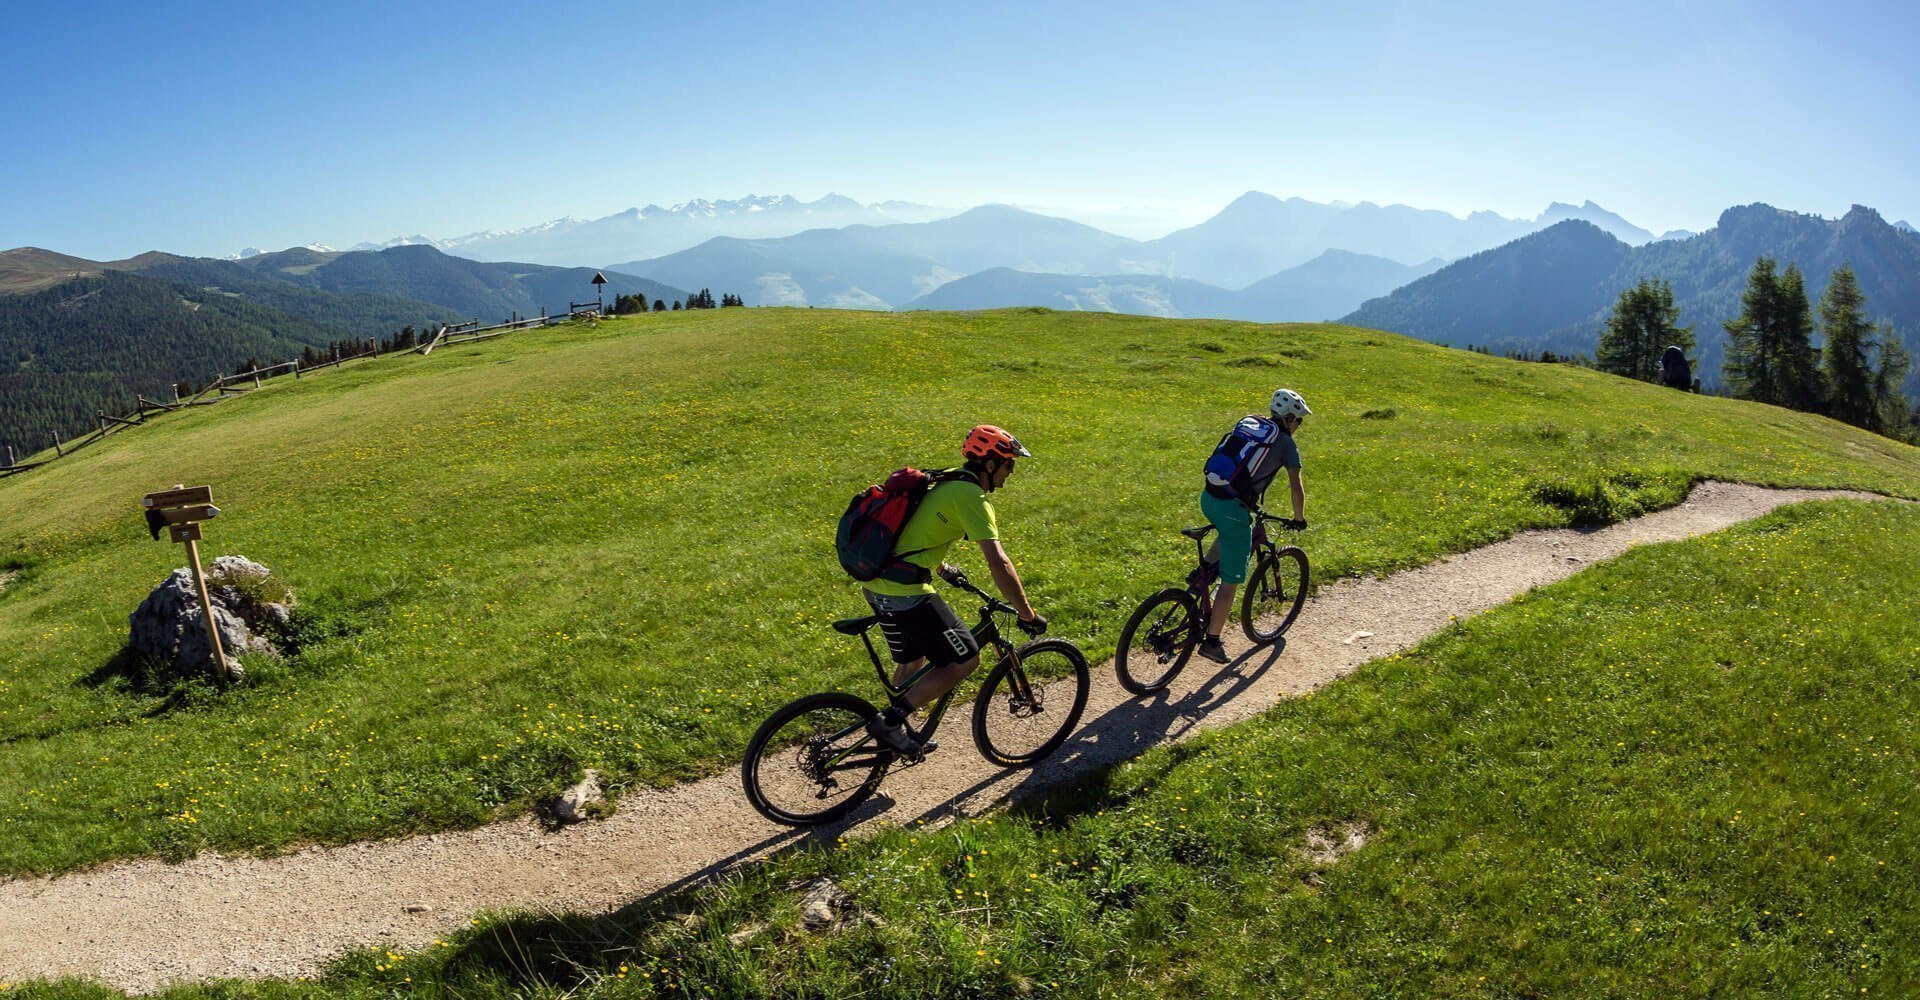 mountainbike-dolomiten-suedtirol